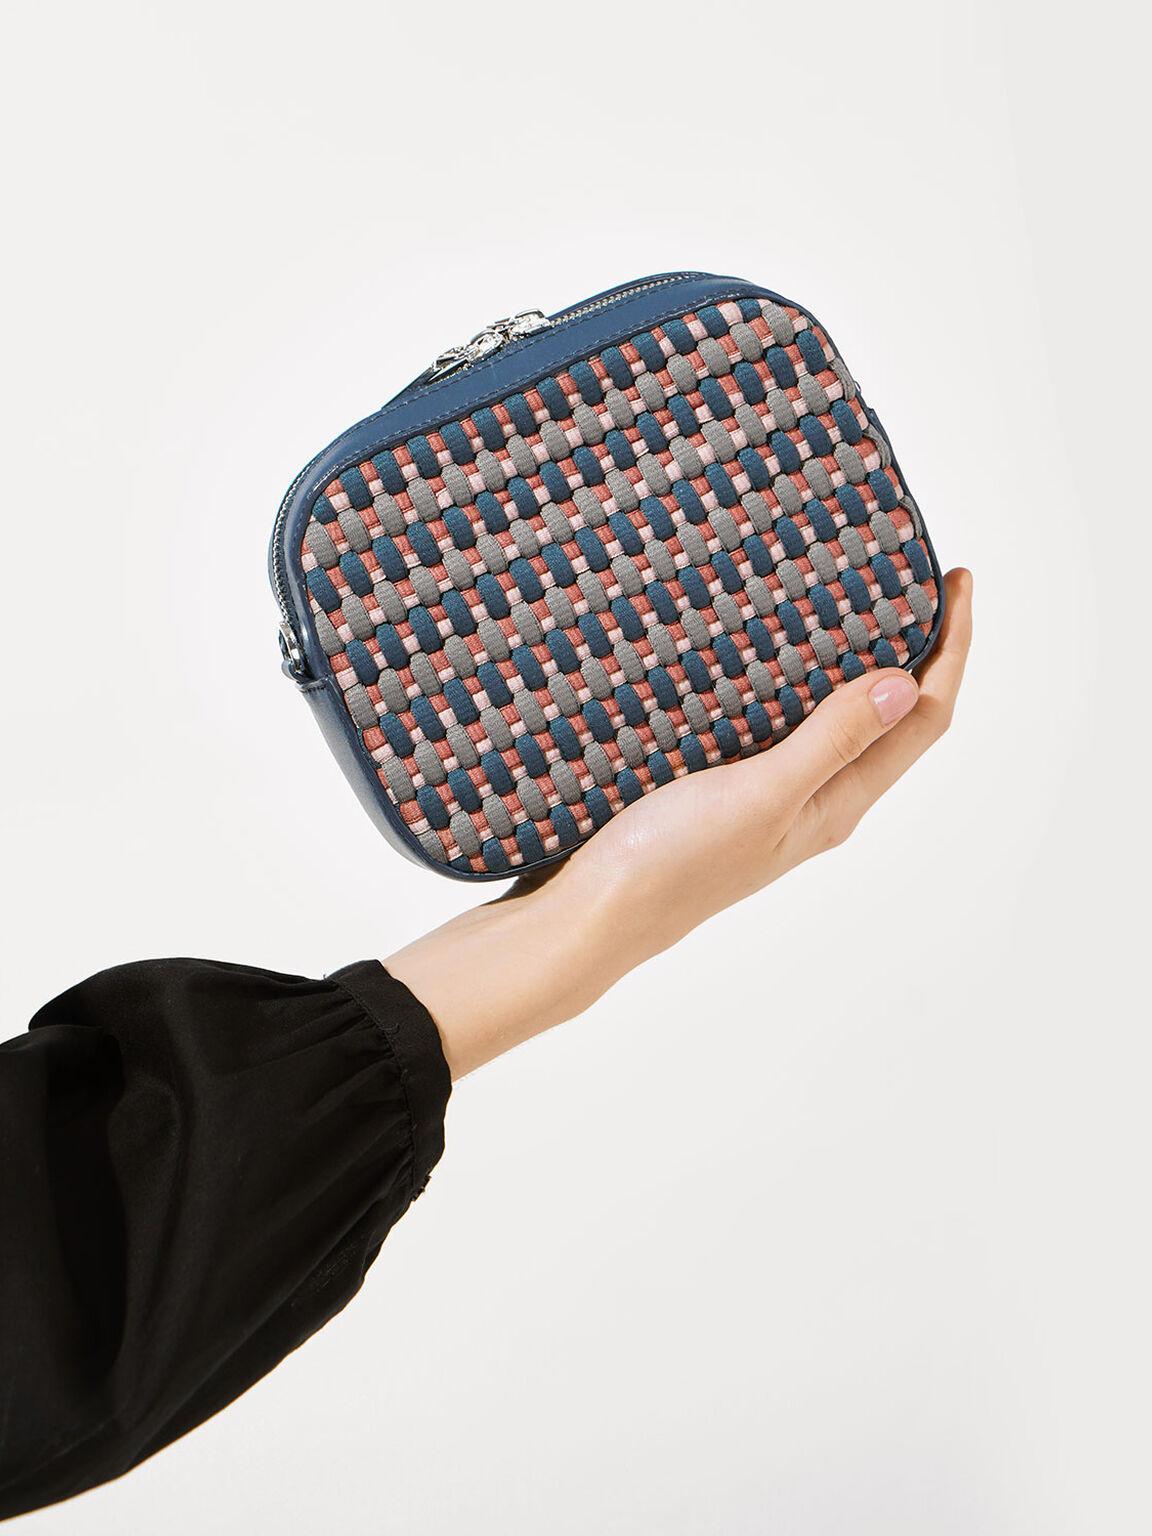 Multicoloured Woven Crossbody Bag, Teal, hi-res